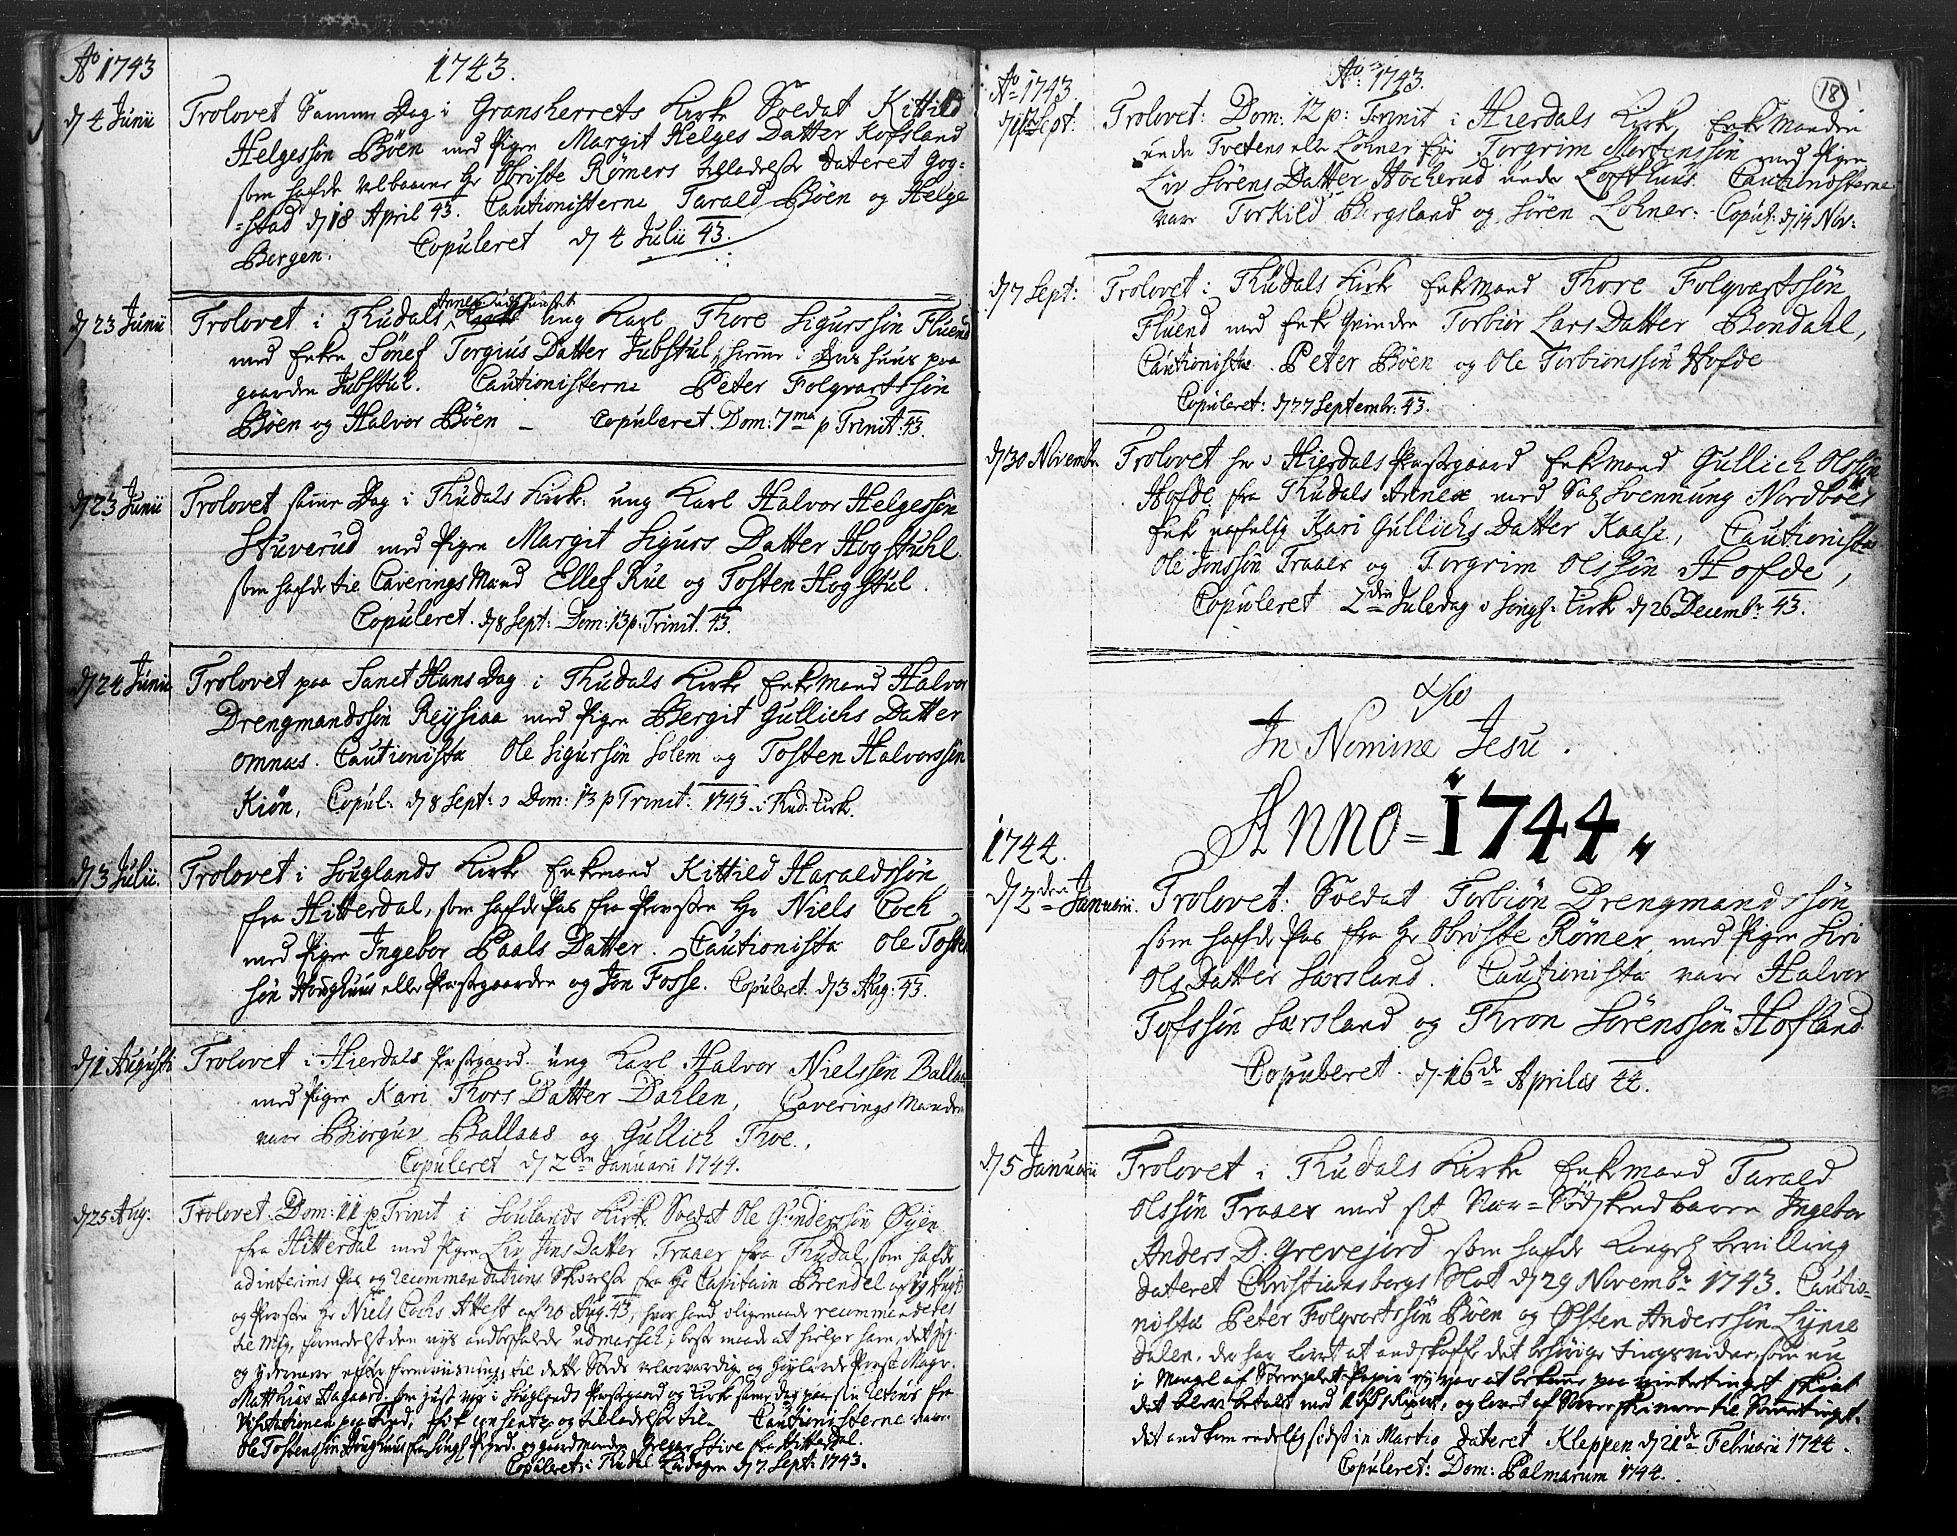 SAKO, Hjartdal kirkebøker, F/Fa/L0004: Ministerialbok nr. I 4, 1727-1795, s. 18